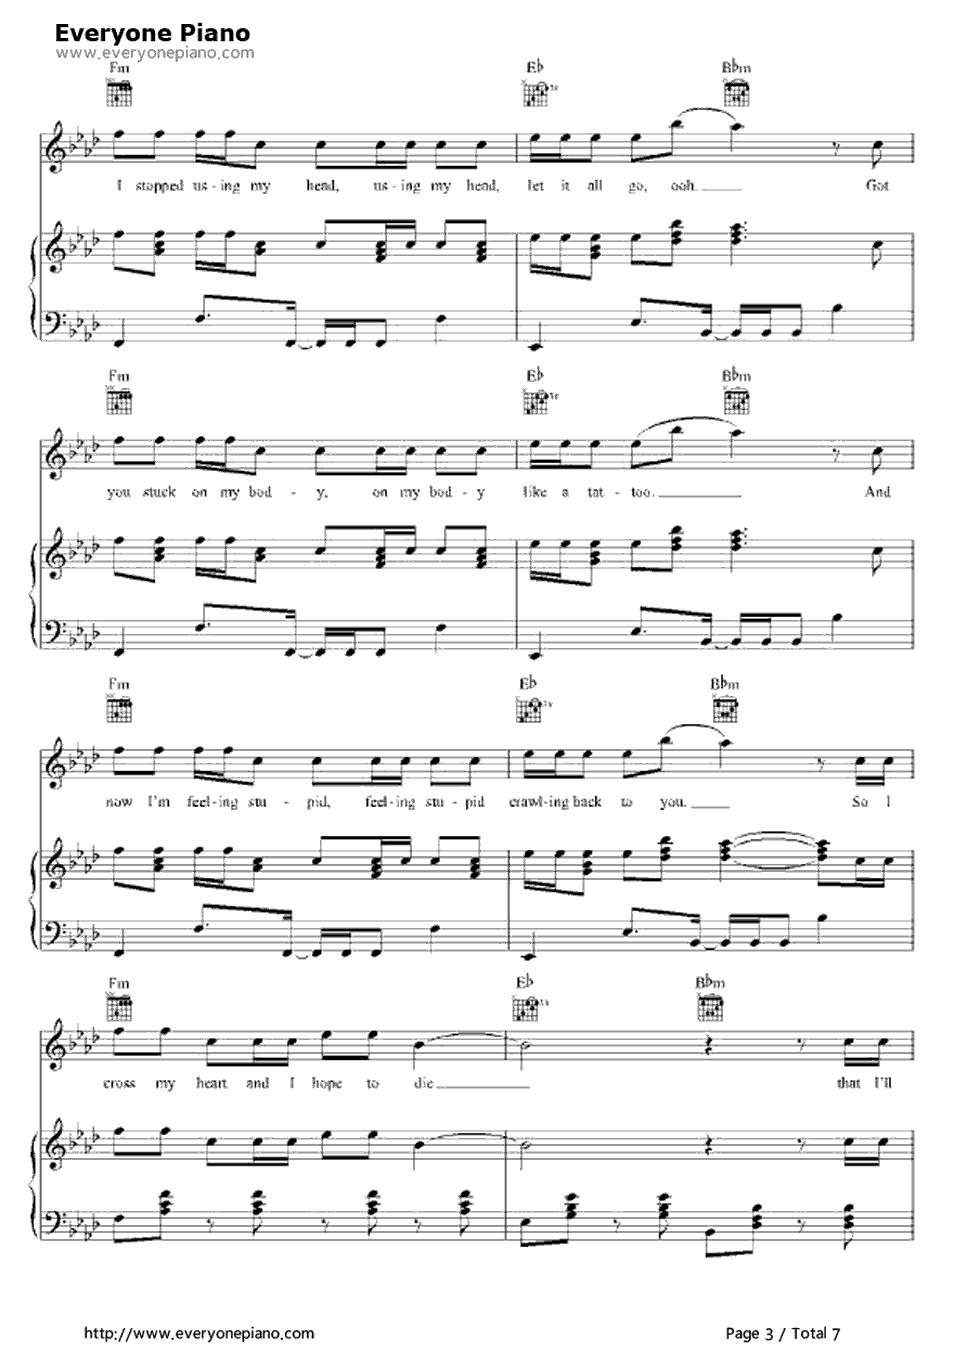 Free One More Night Maroon 5 Piano Sheet Music Preview 3 Free Piano Sheet Music Piano Chords One More Night Sheet Music Maroon 5